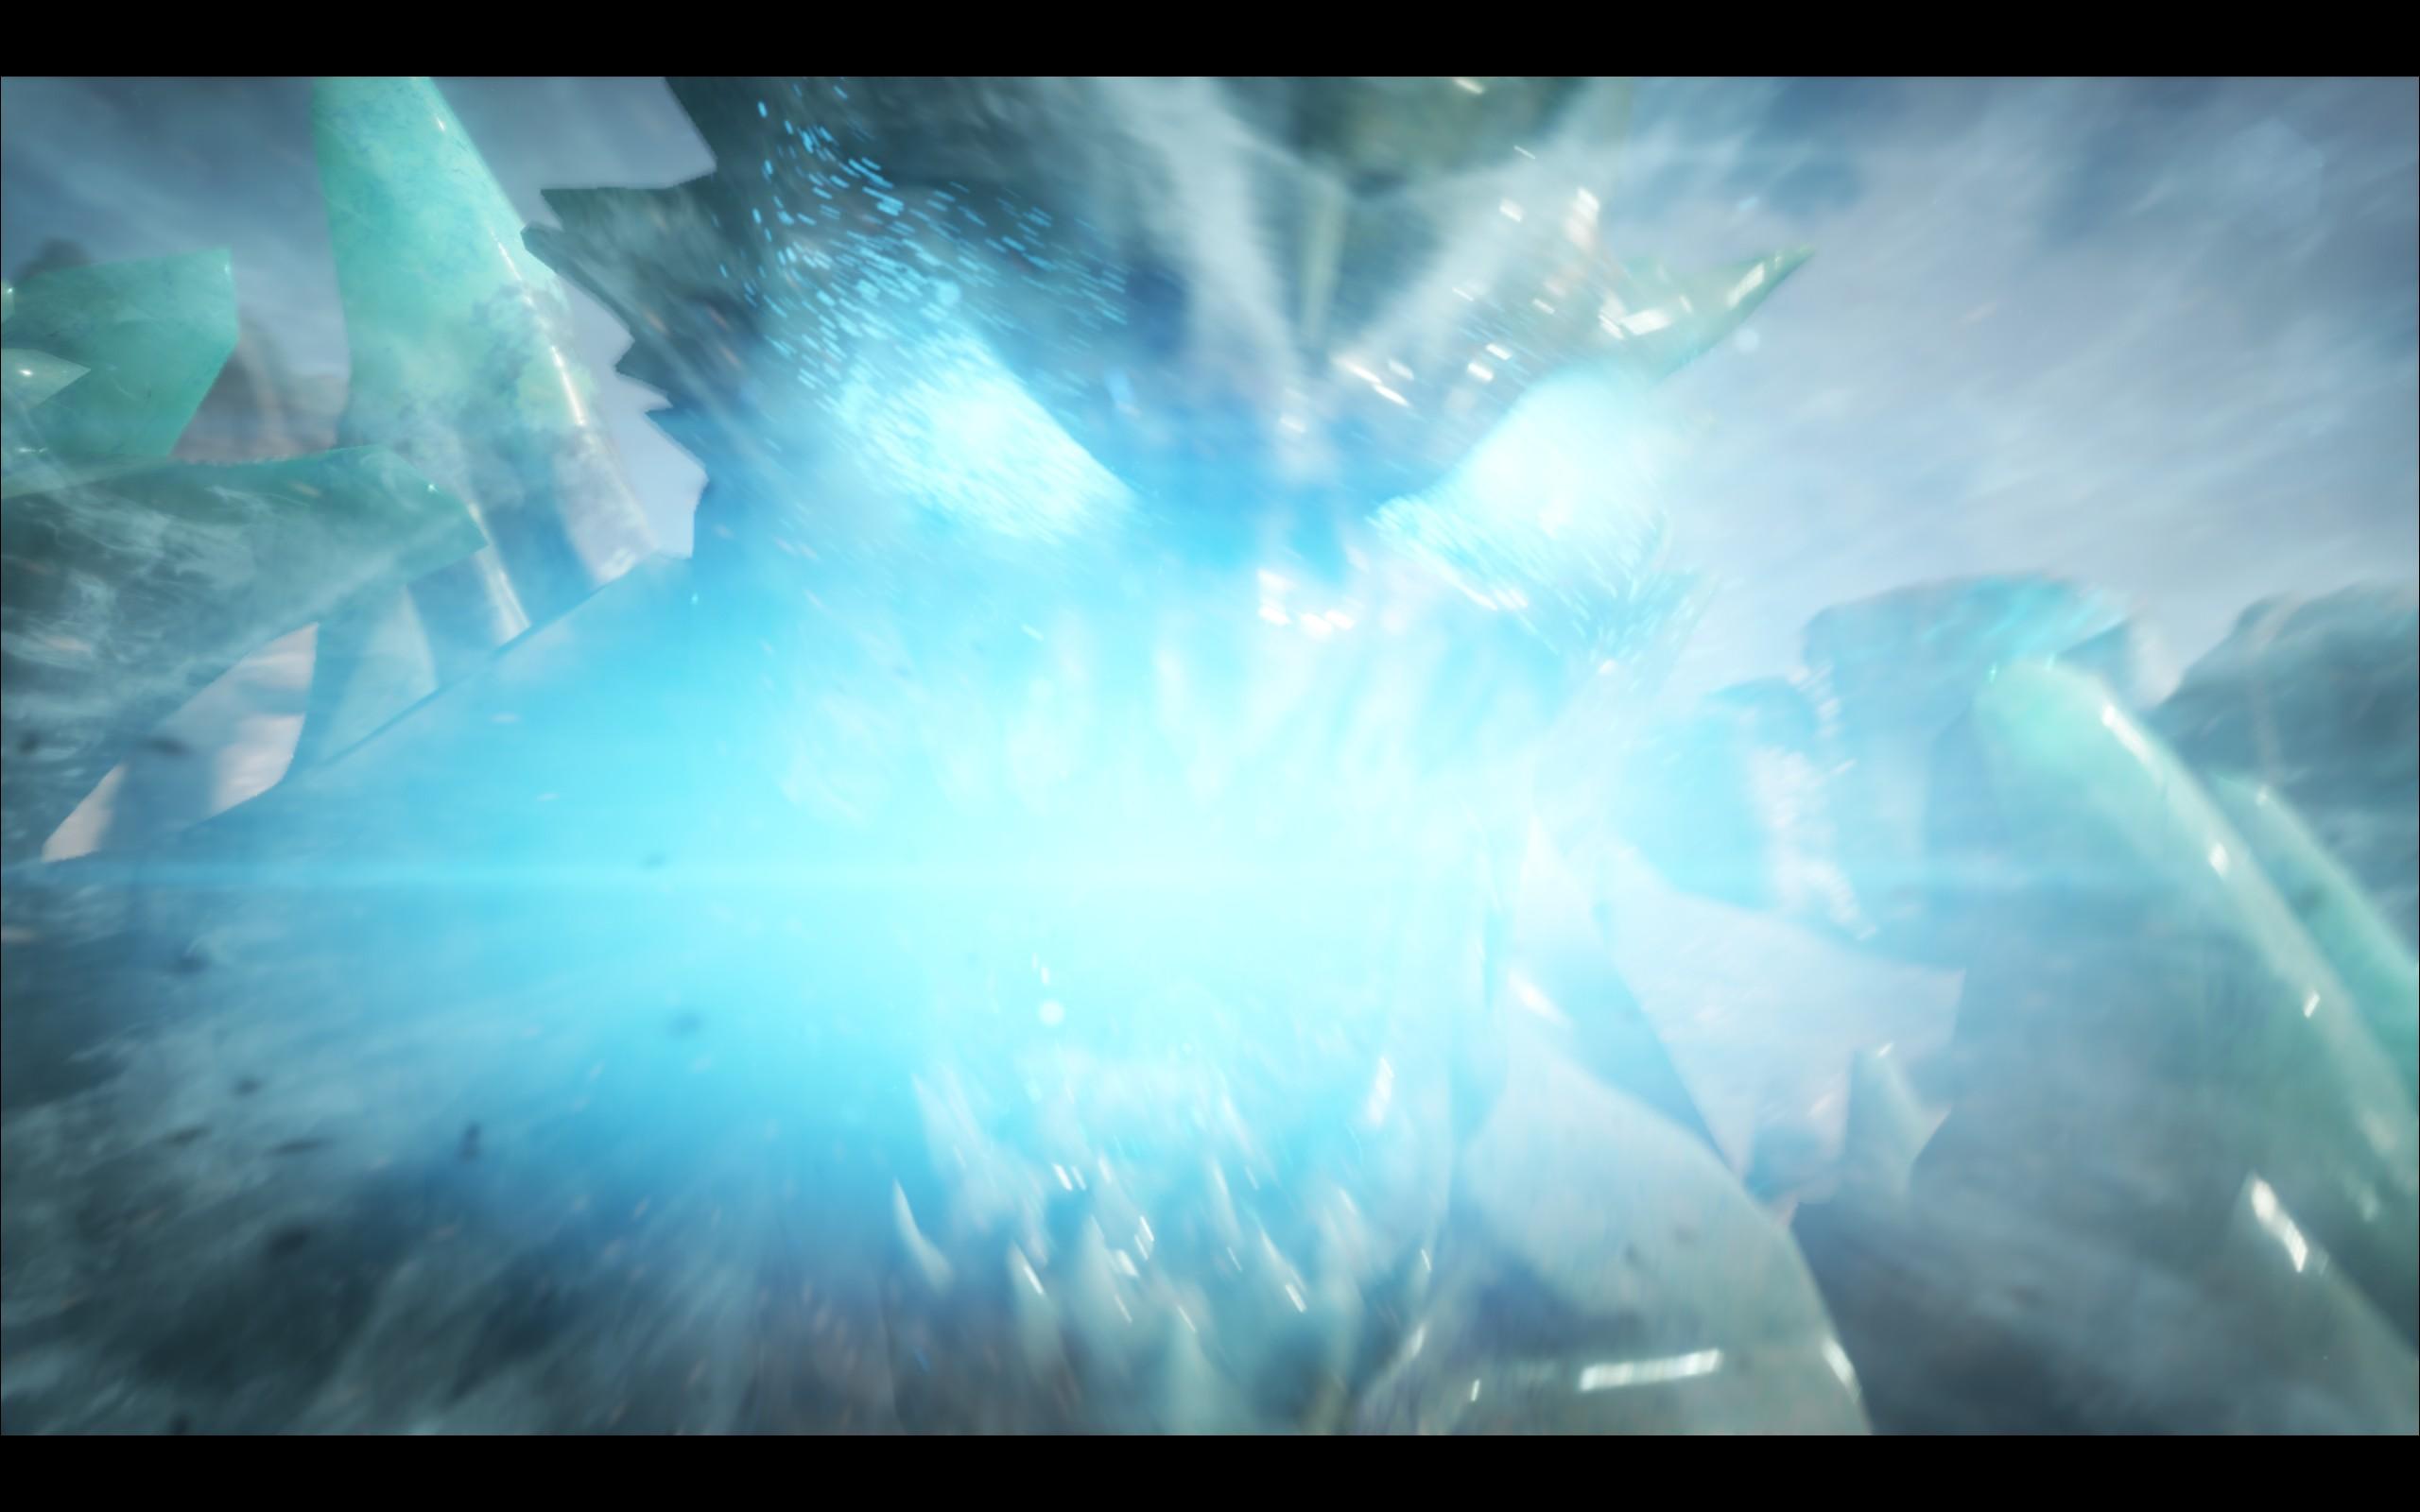 Unreal-Engine-4_2013_02-20-13_002